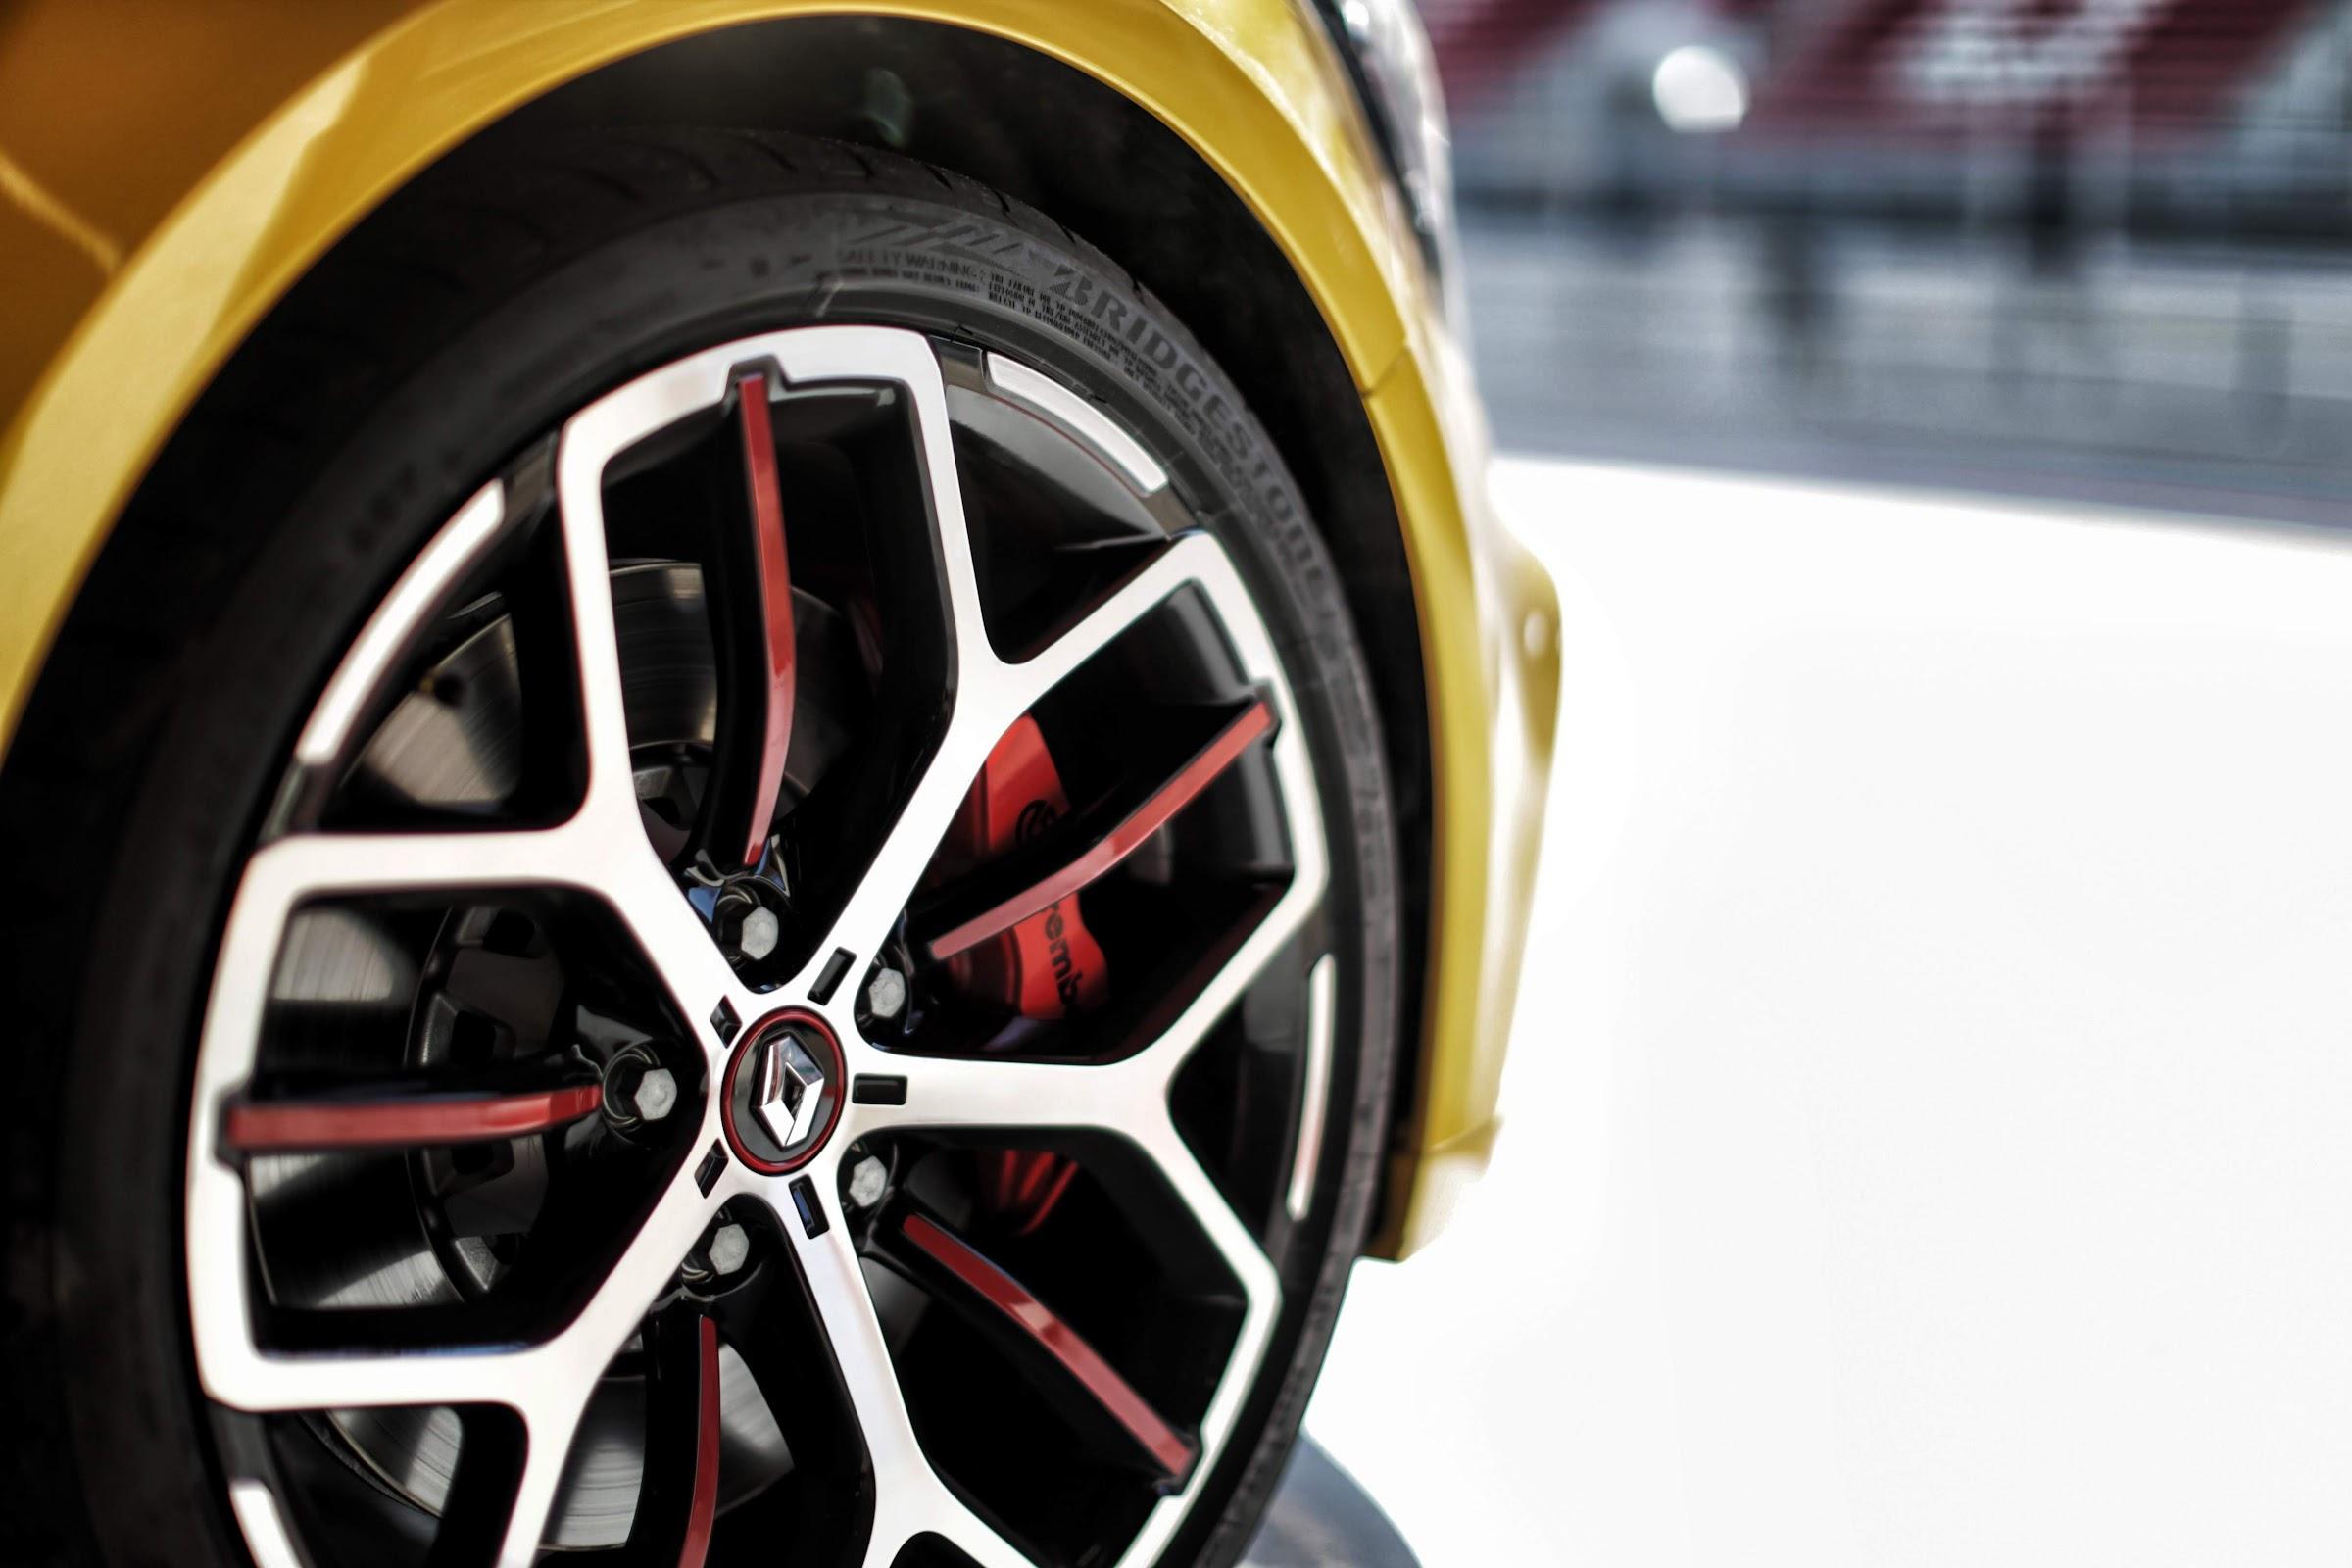 ZeolwpVxfcrxMNKSXMG4h9Ilgc7BL5 lBBik13lbYtDh6wW7 T0aPLPfW1OMrfGBC9zAjltqRaScaX 6b0IhJaxPIpJh3kUWS6peeTBlHDK   HECEXX4bz5fn8HoIxkq6v606vfKQ=w2400 - Nuevo Renault Mégane R.S. Trophy